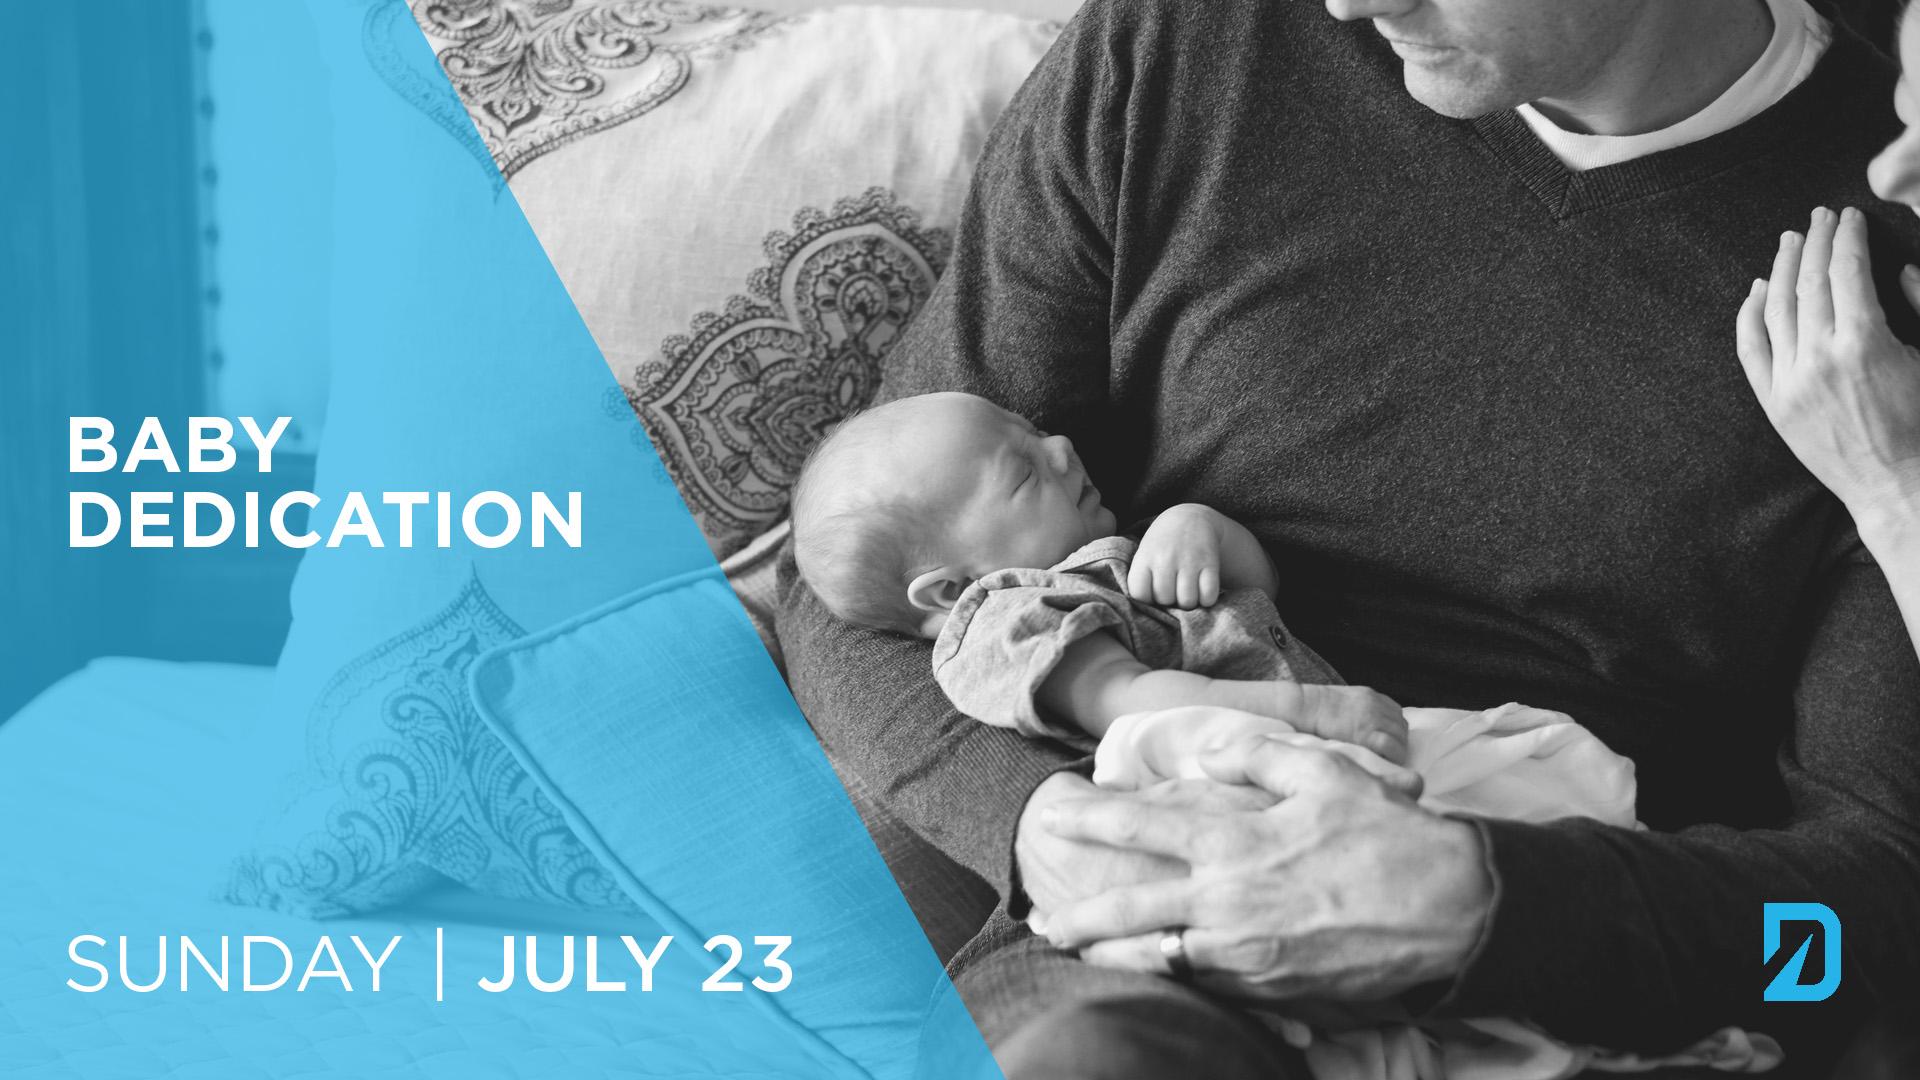 BabyDedication_July2017.jpg